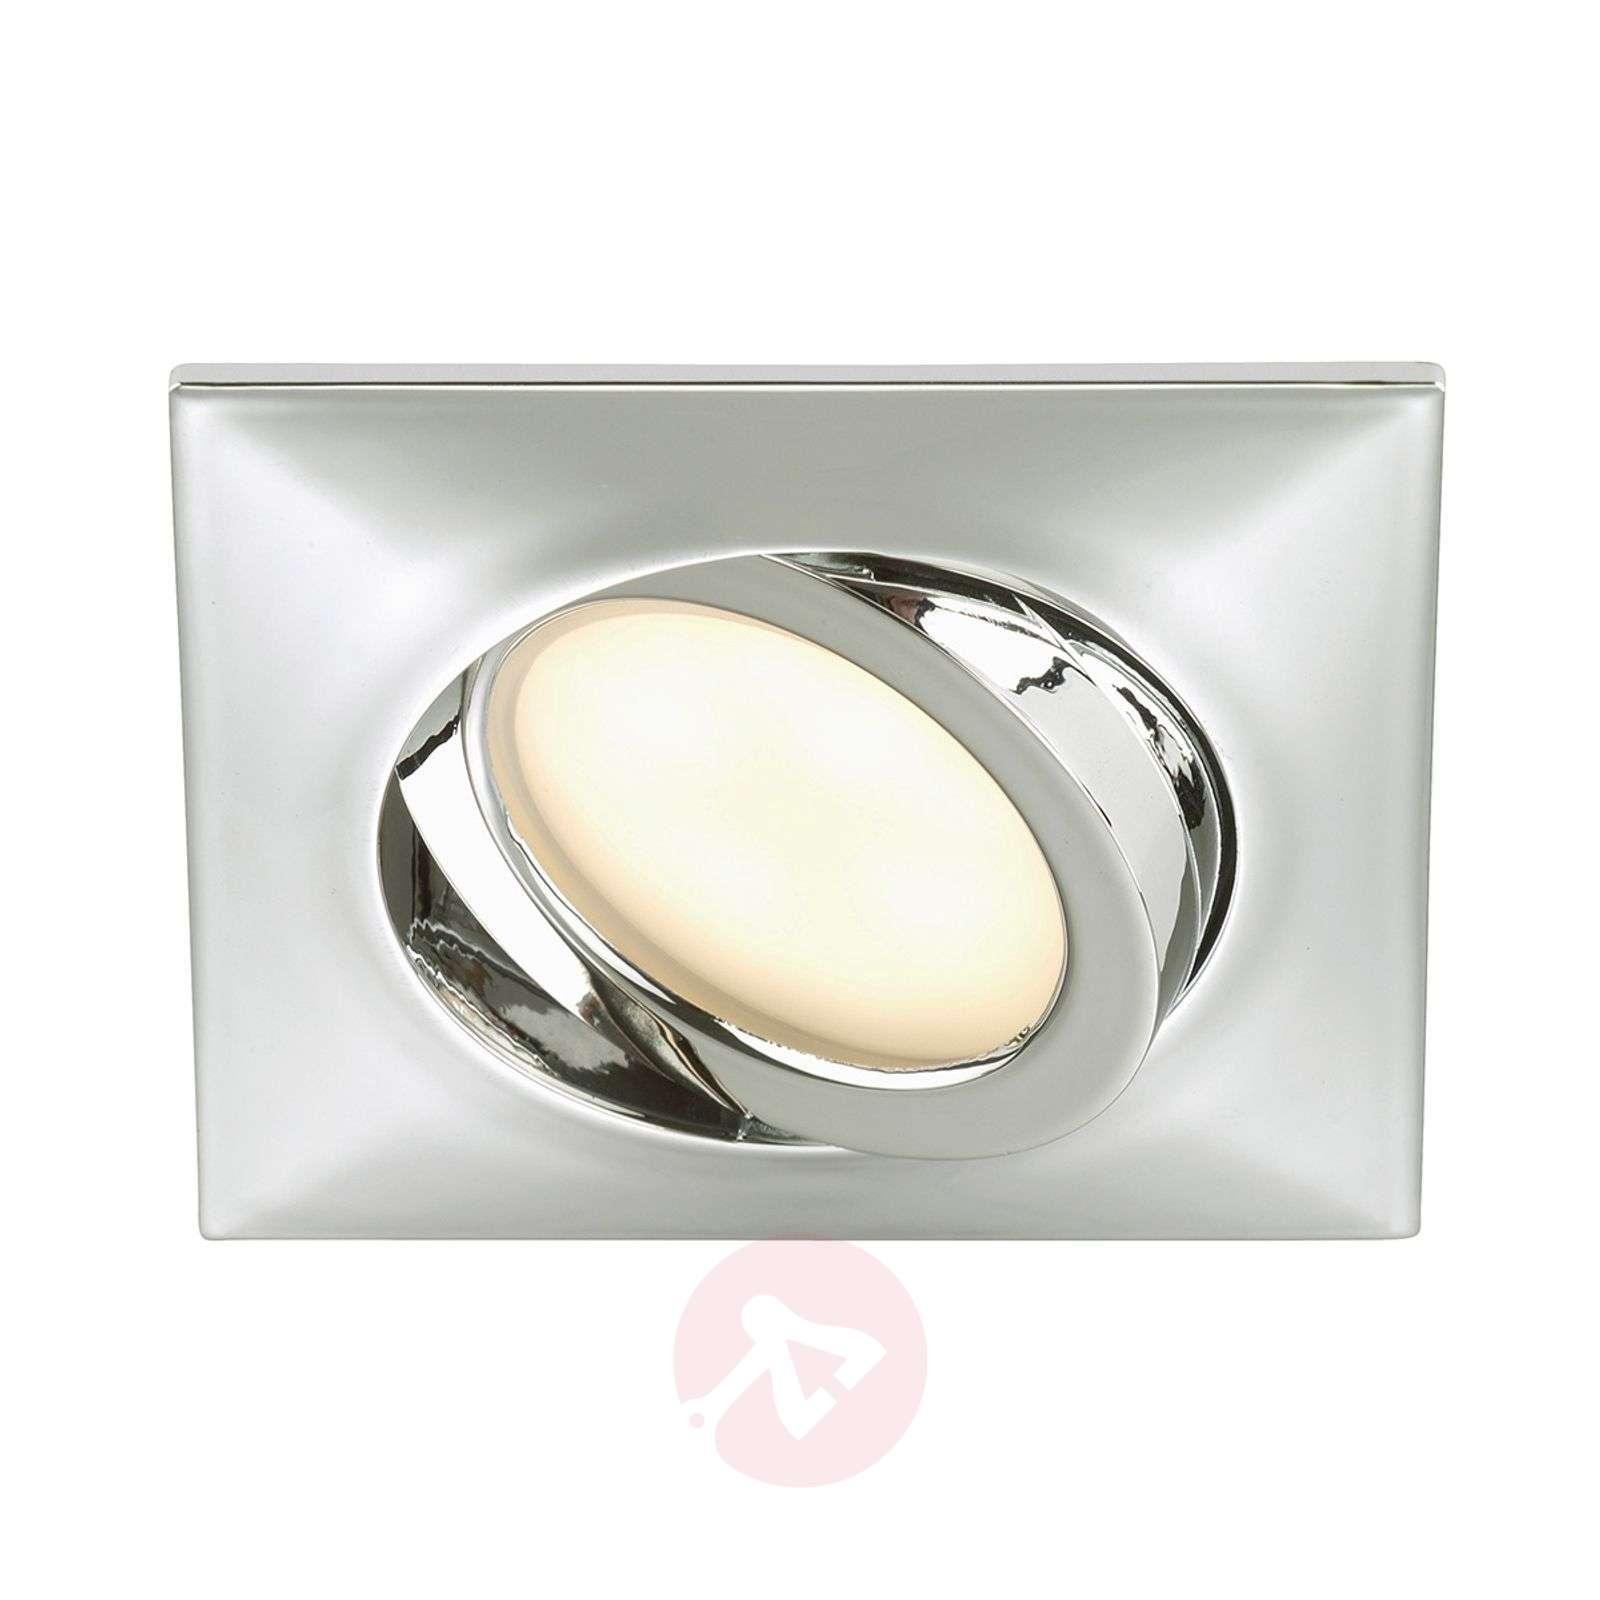 Rectangular led recessed light erik chrome lights rectangular led recessed light erik chrome 1510289 01 aloadofball Gallery